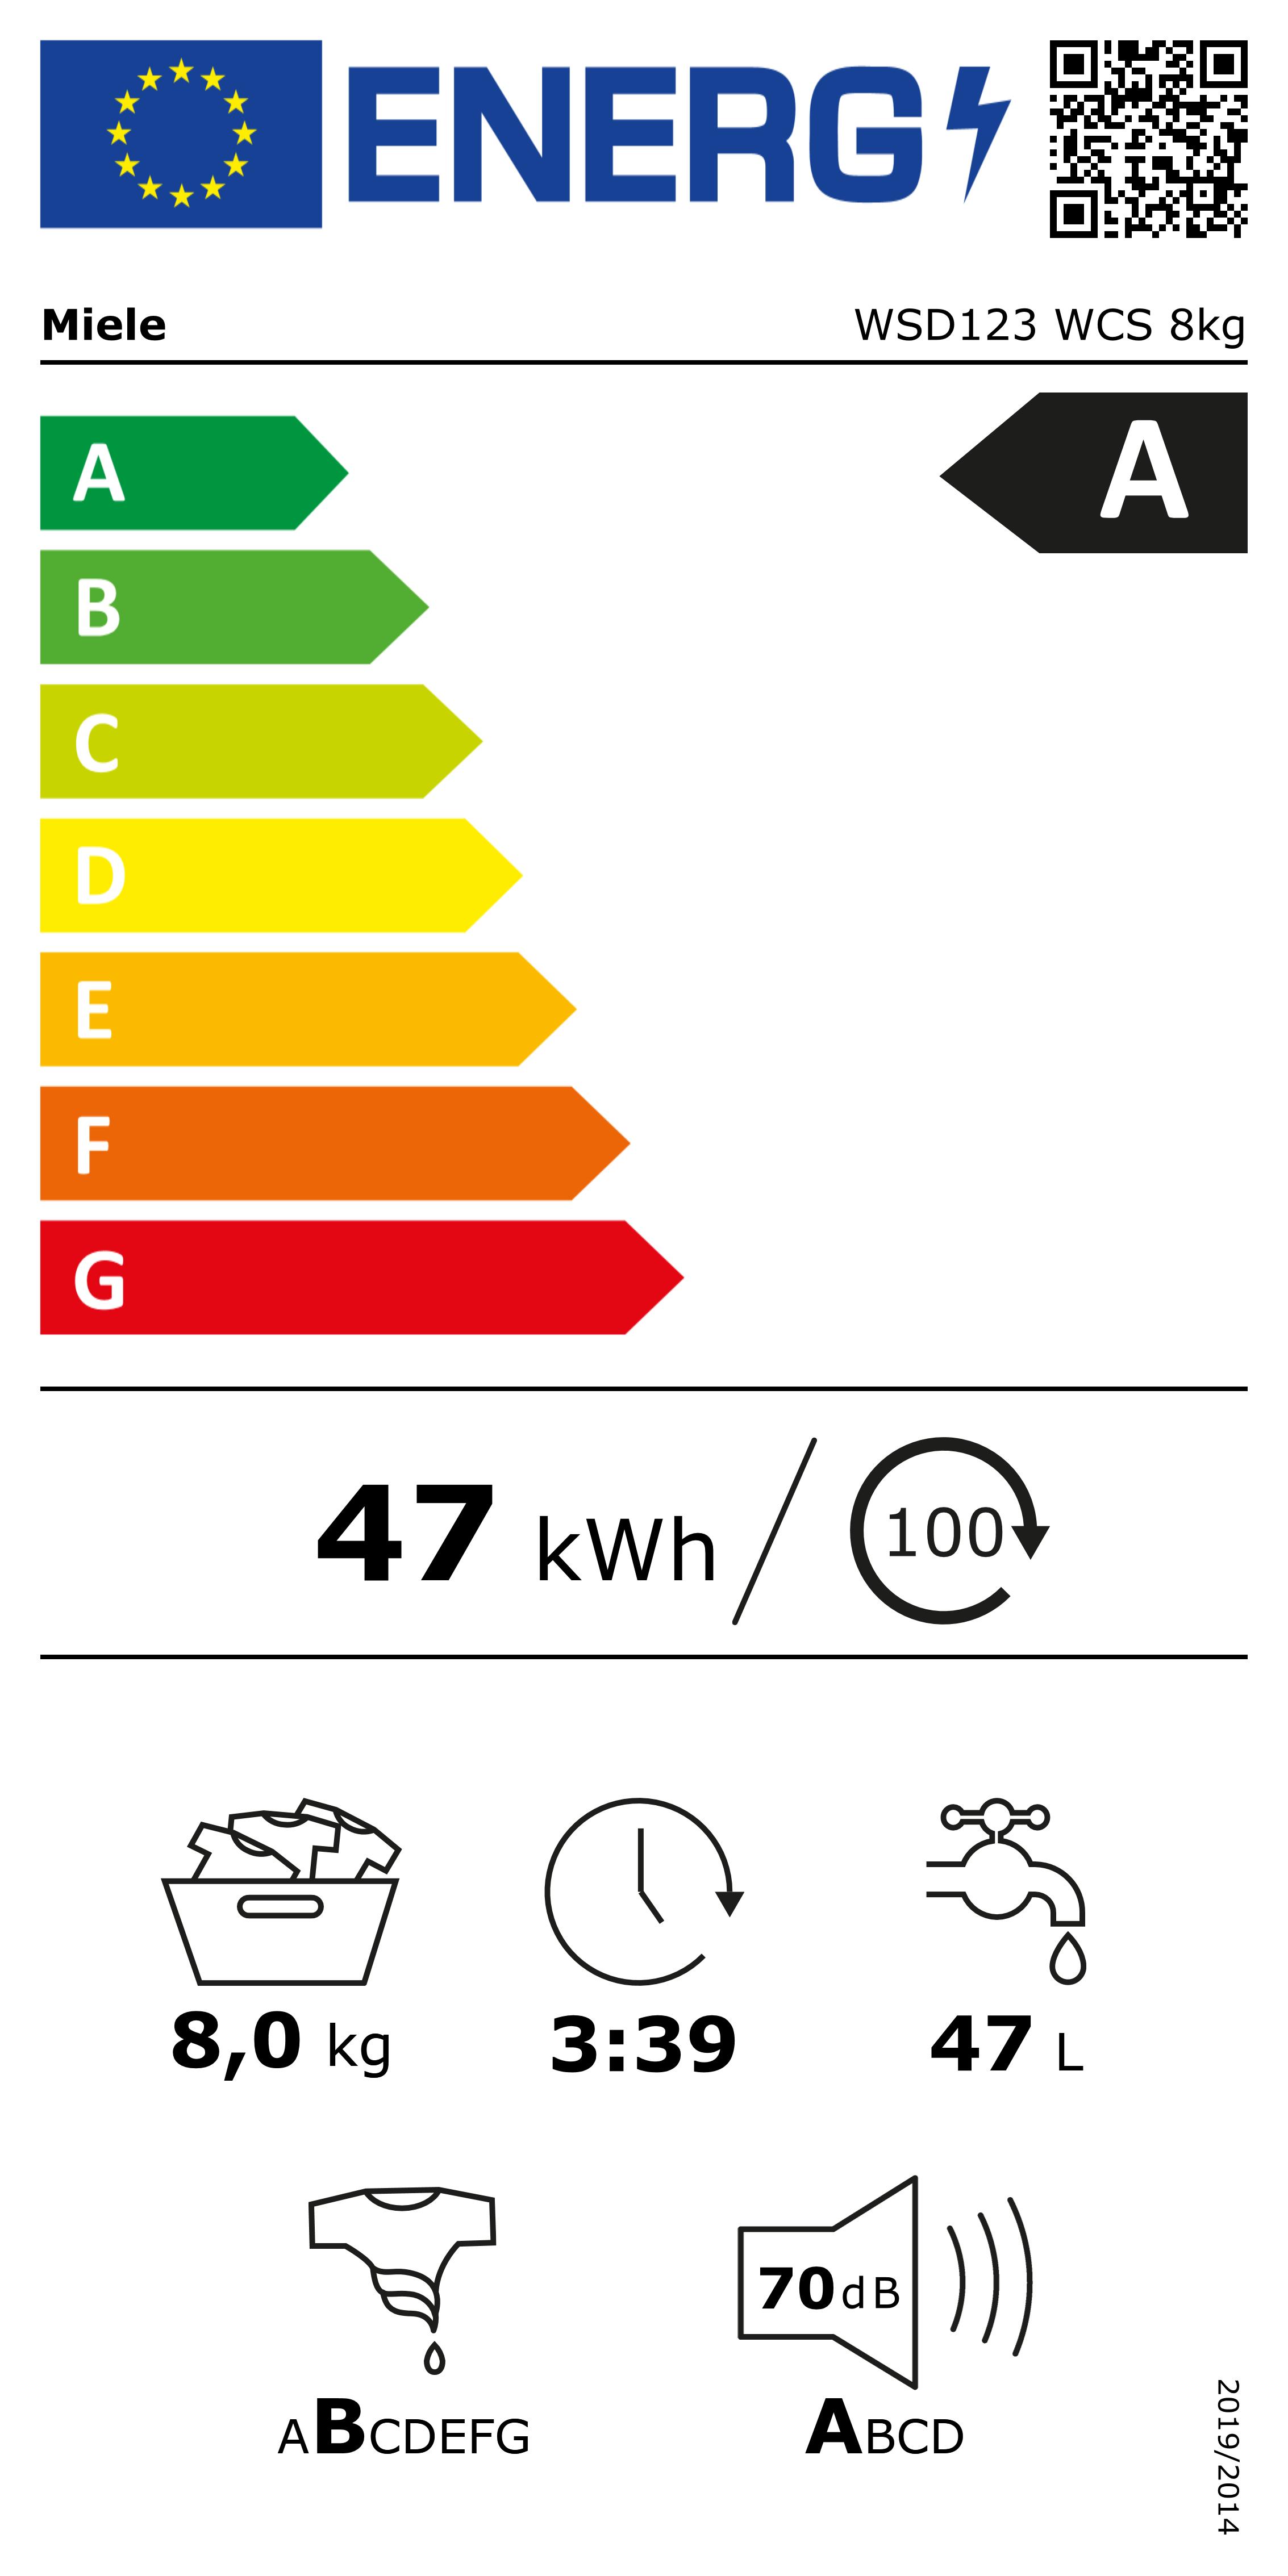 Energielabel Beispiel